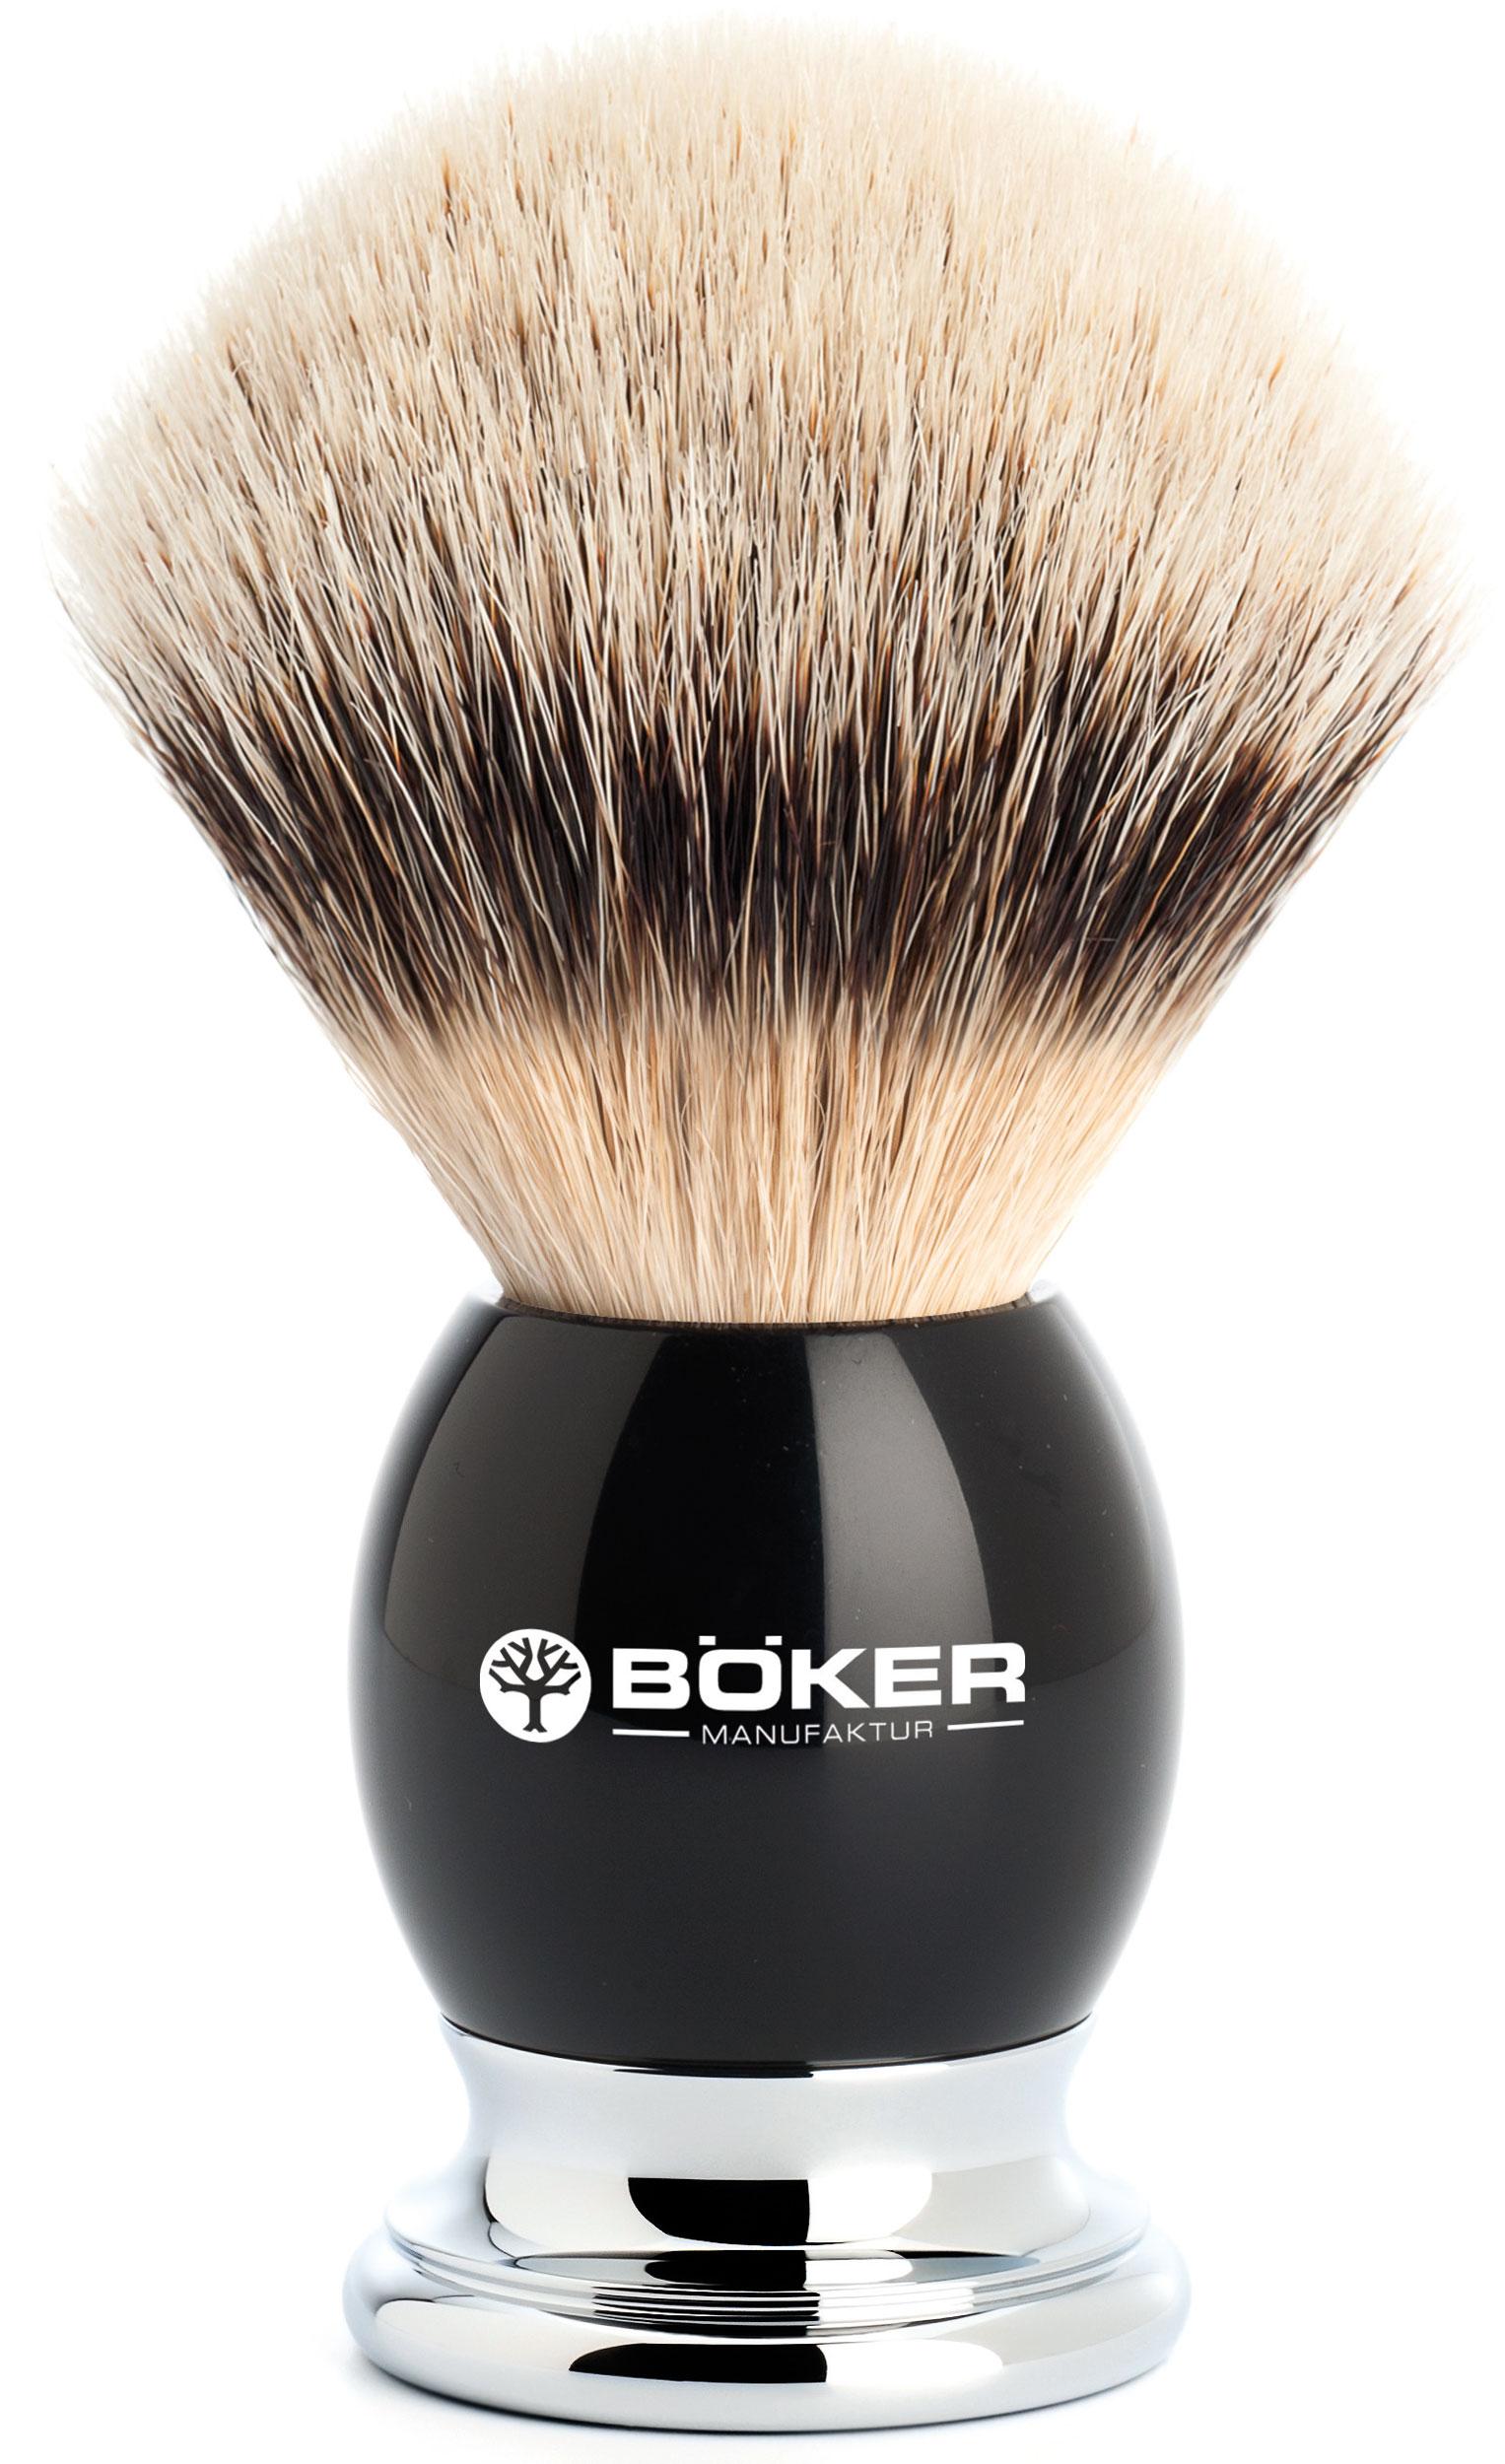 Boker Silvertip Badger Shaving Brush, Grenadill Wood Handle